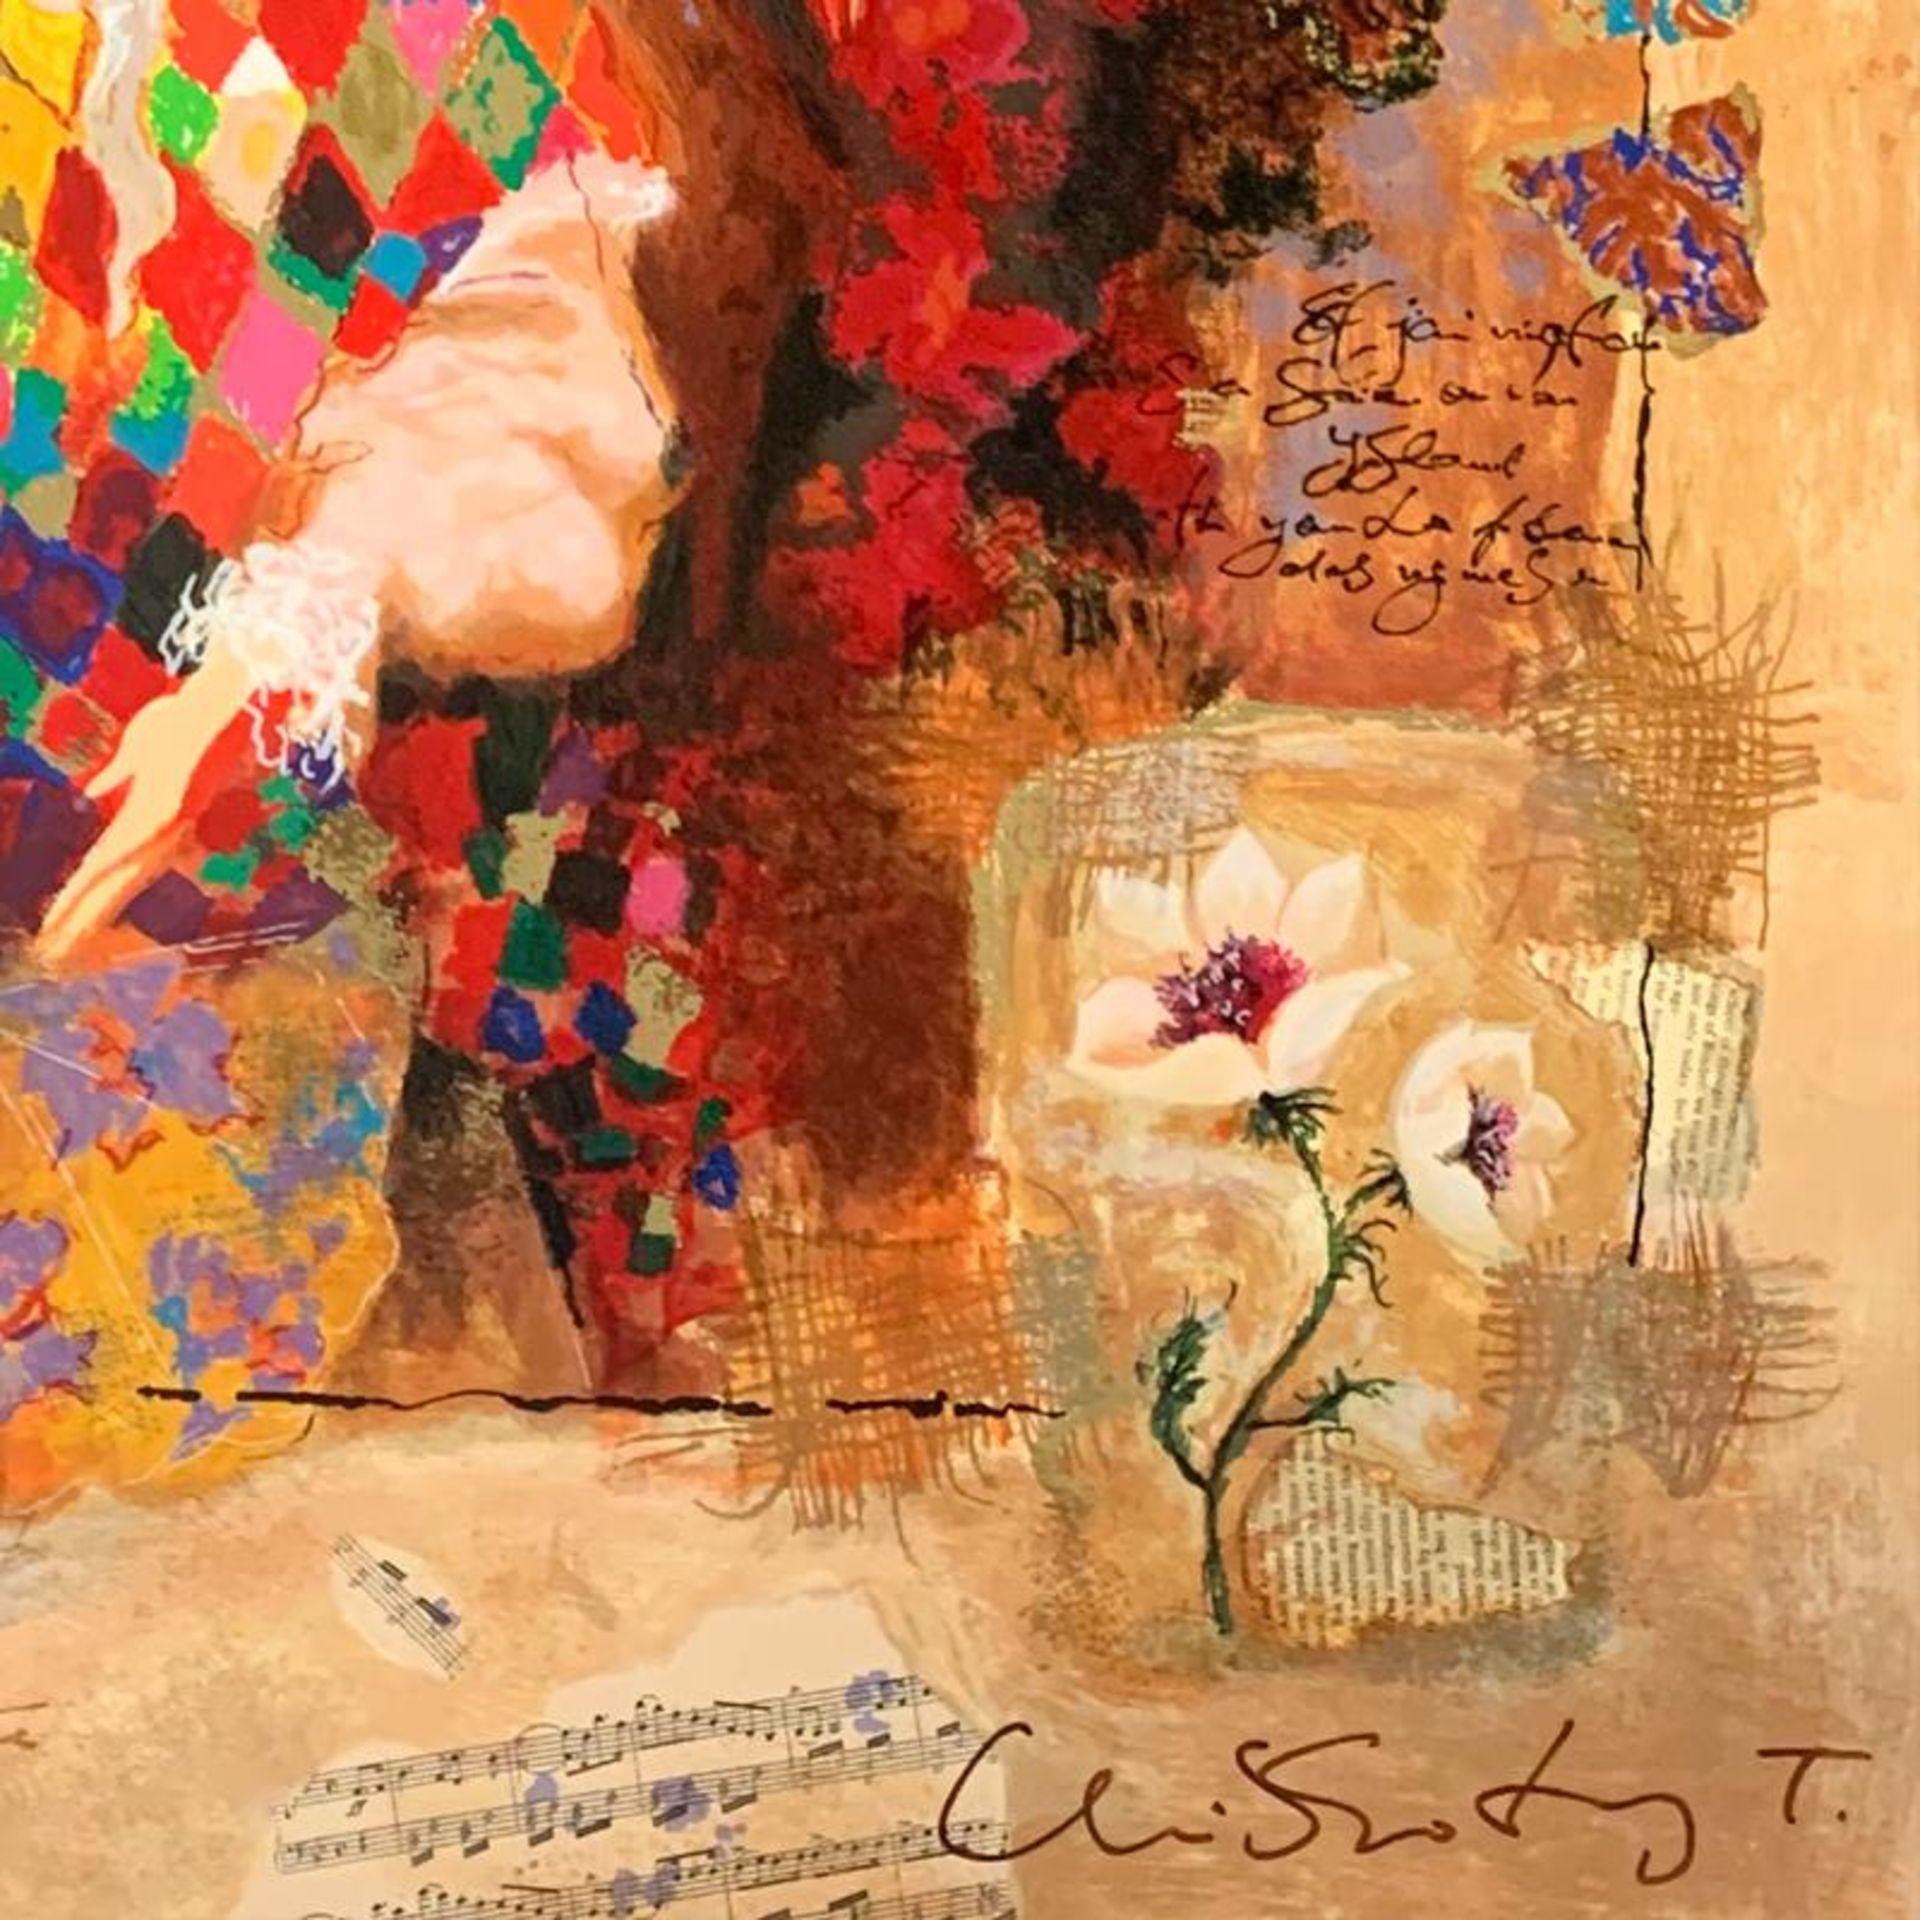 Ladies by Alexander & Wissotzky - Image 2 of 3